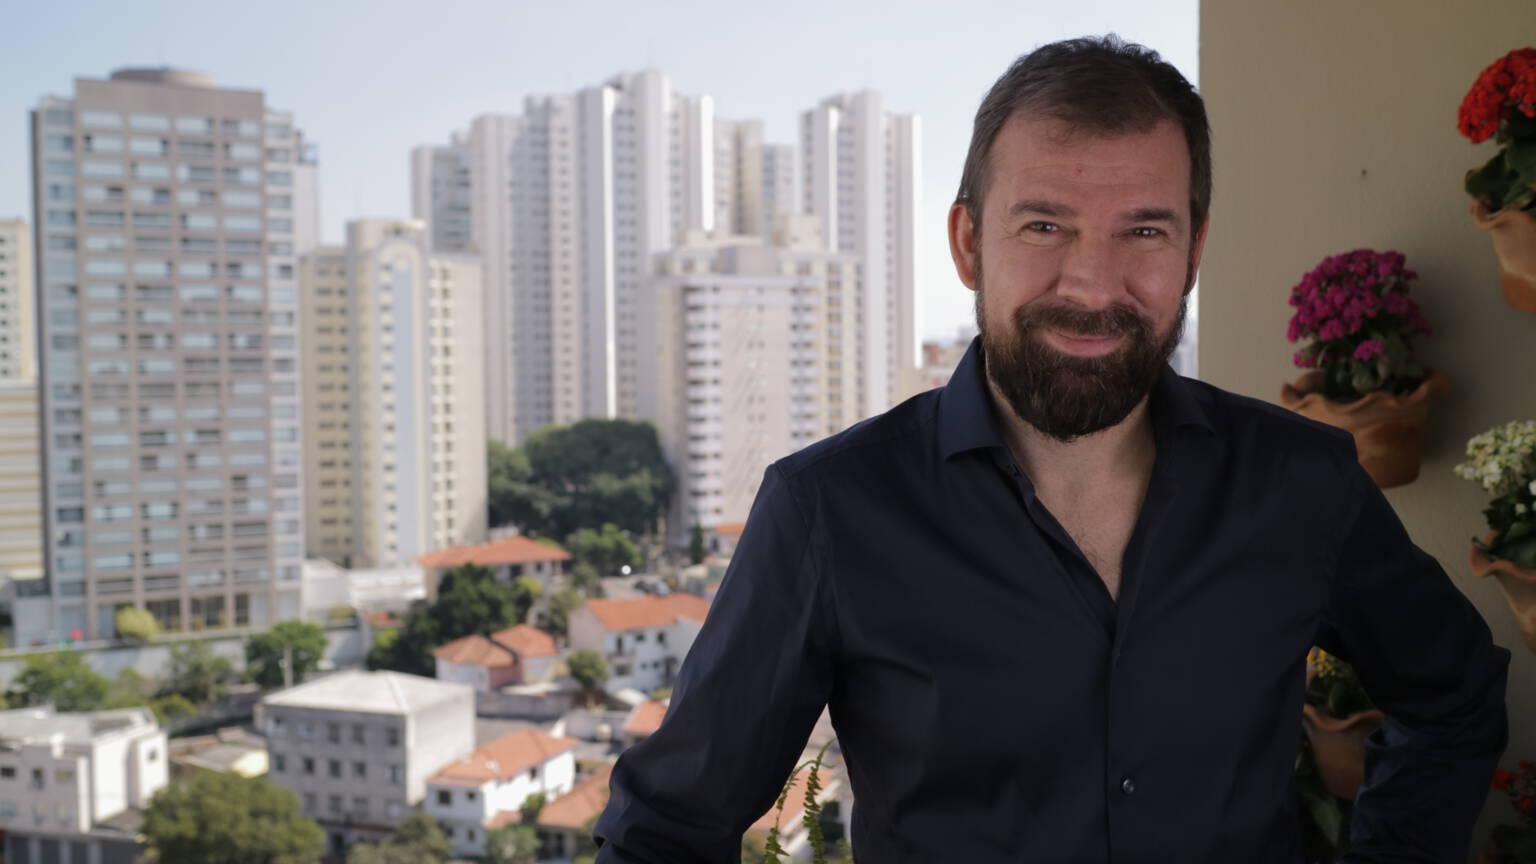 Dutch NOS correspondent Marc Bessems on his balcony in São Paulo, Brazil